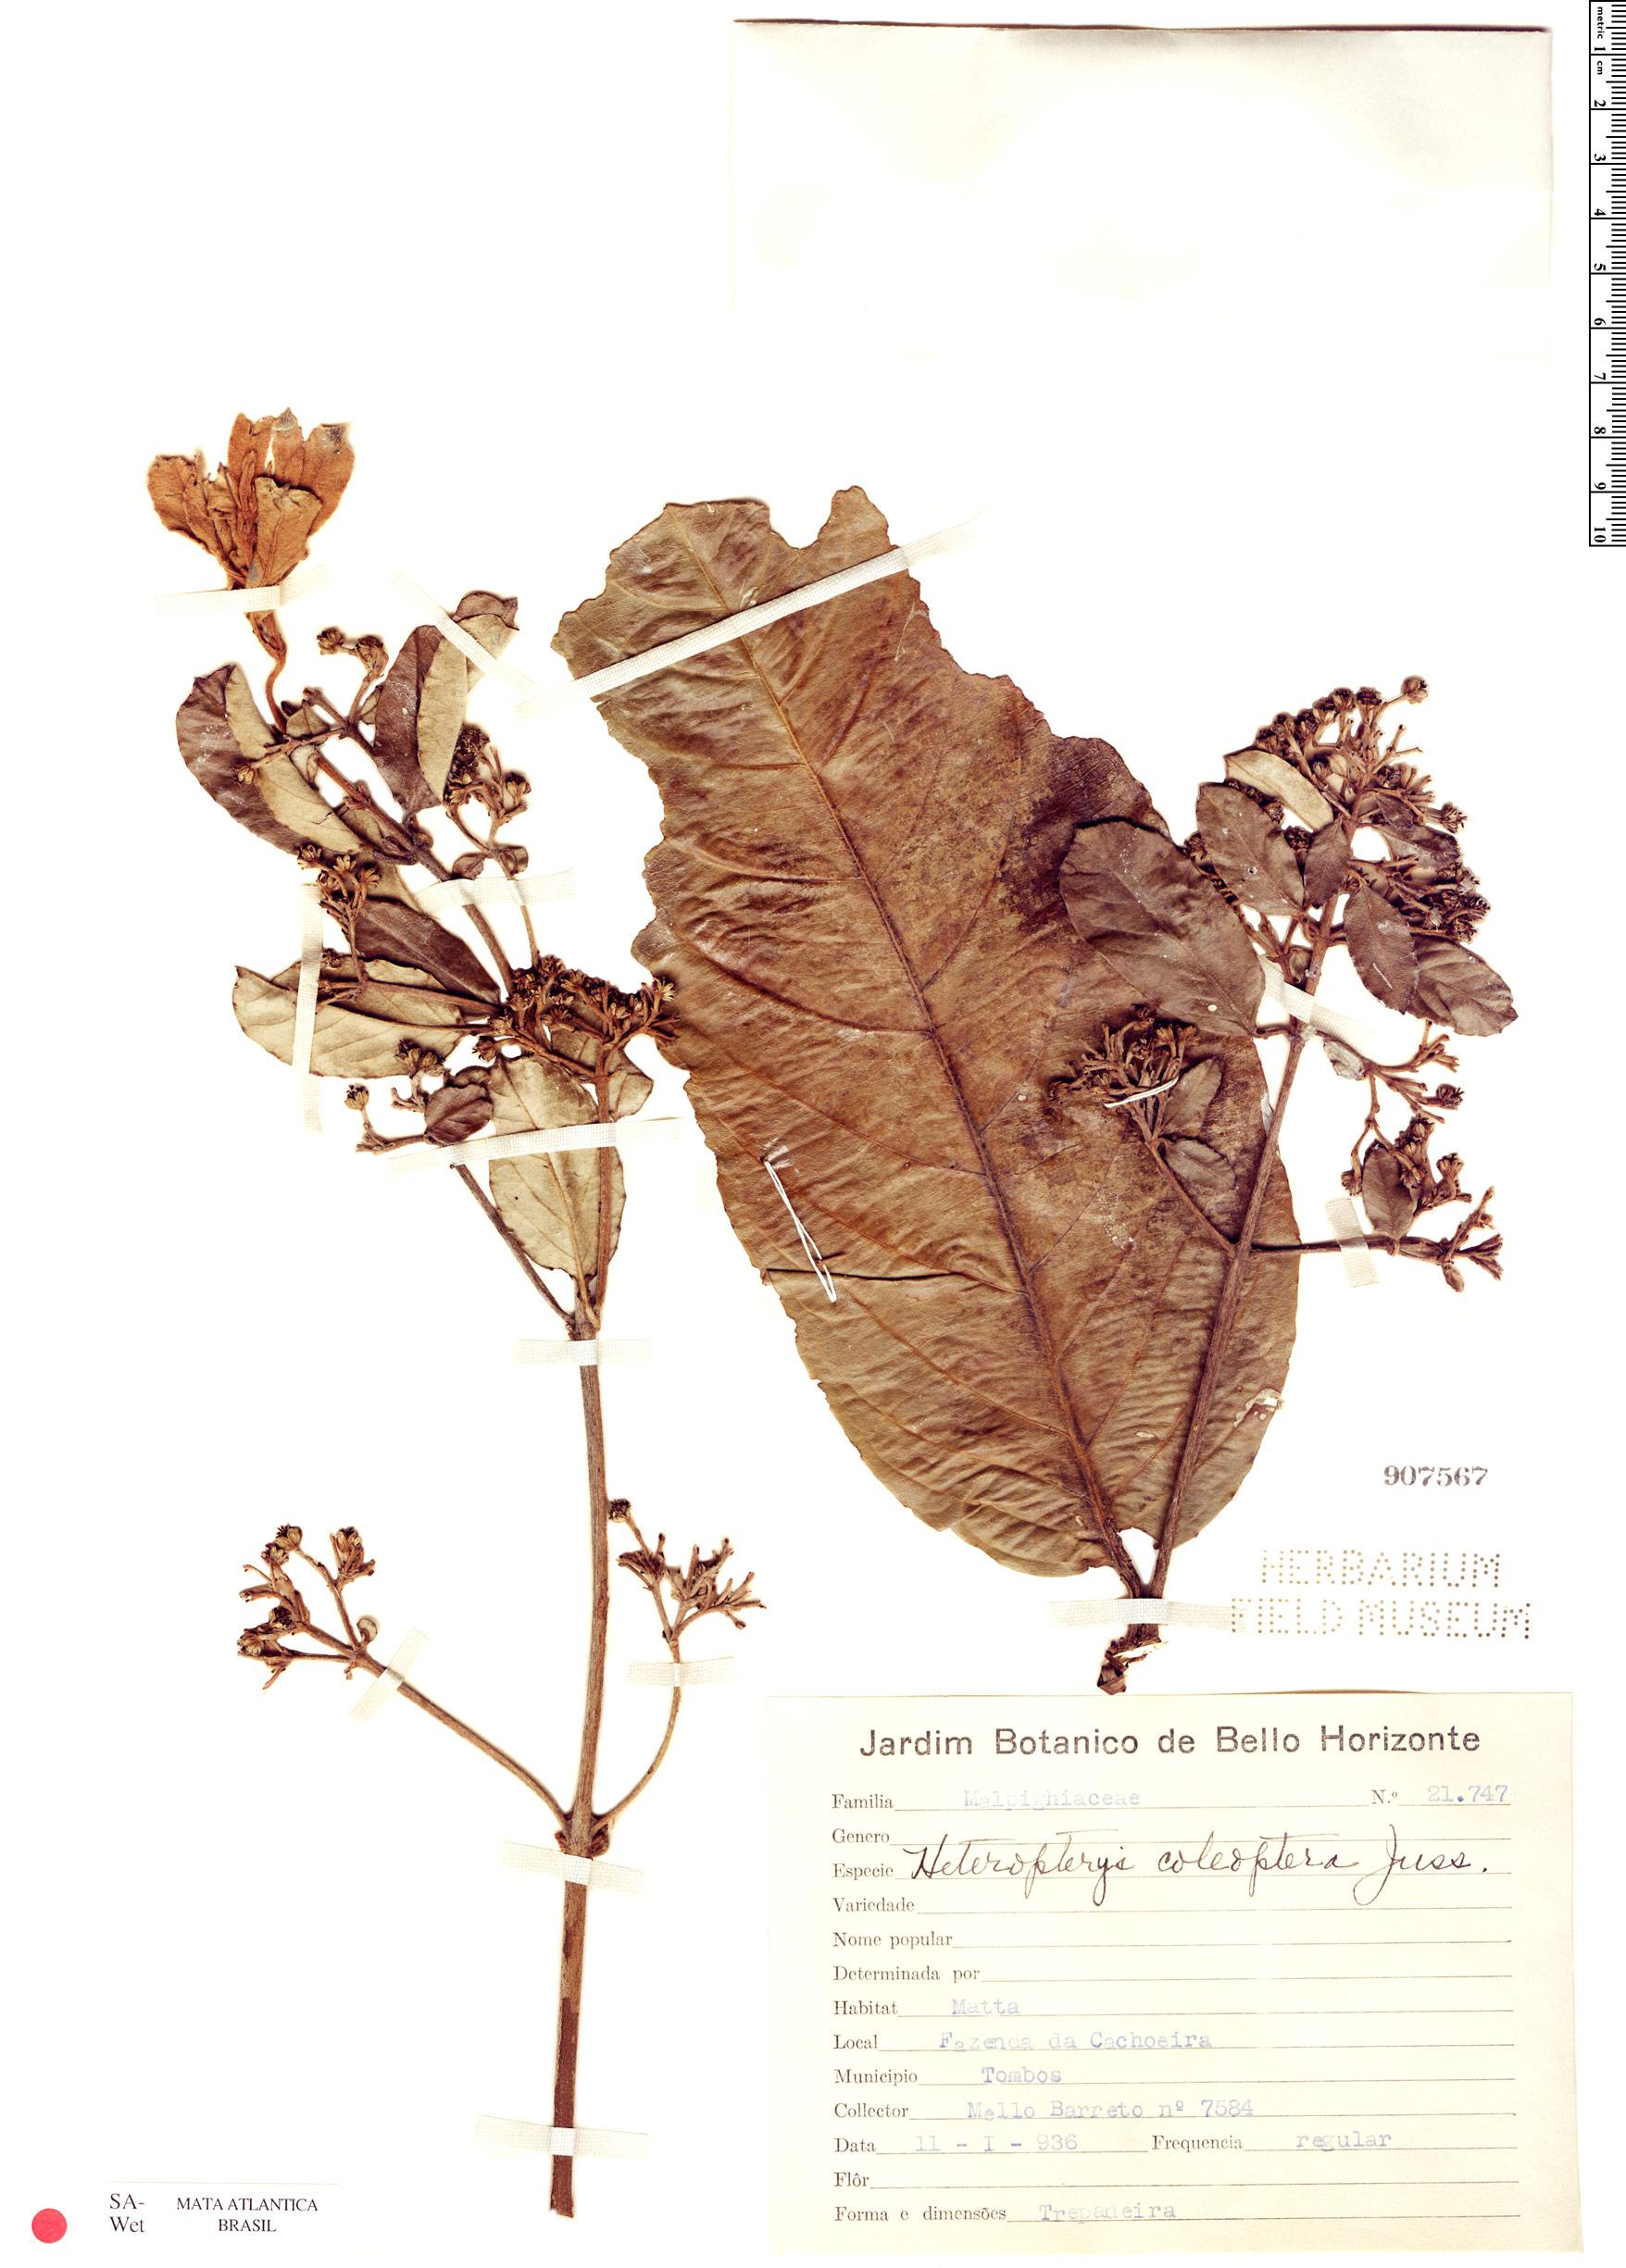 Espécime: Heteropterys coleoptera